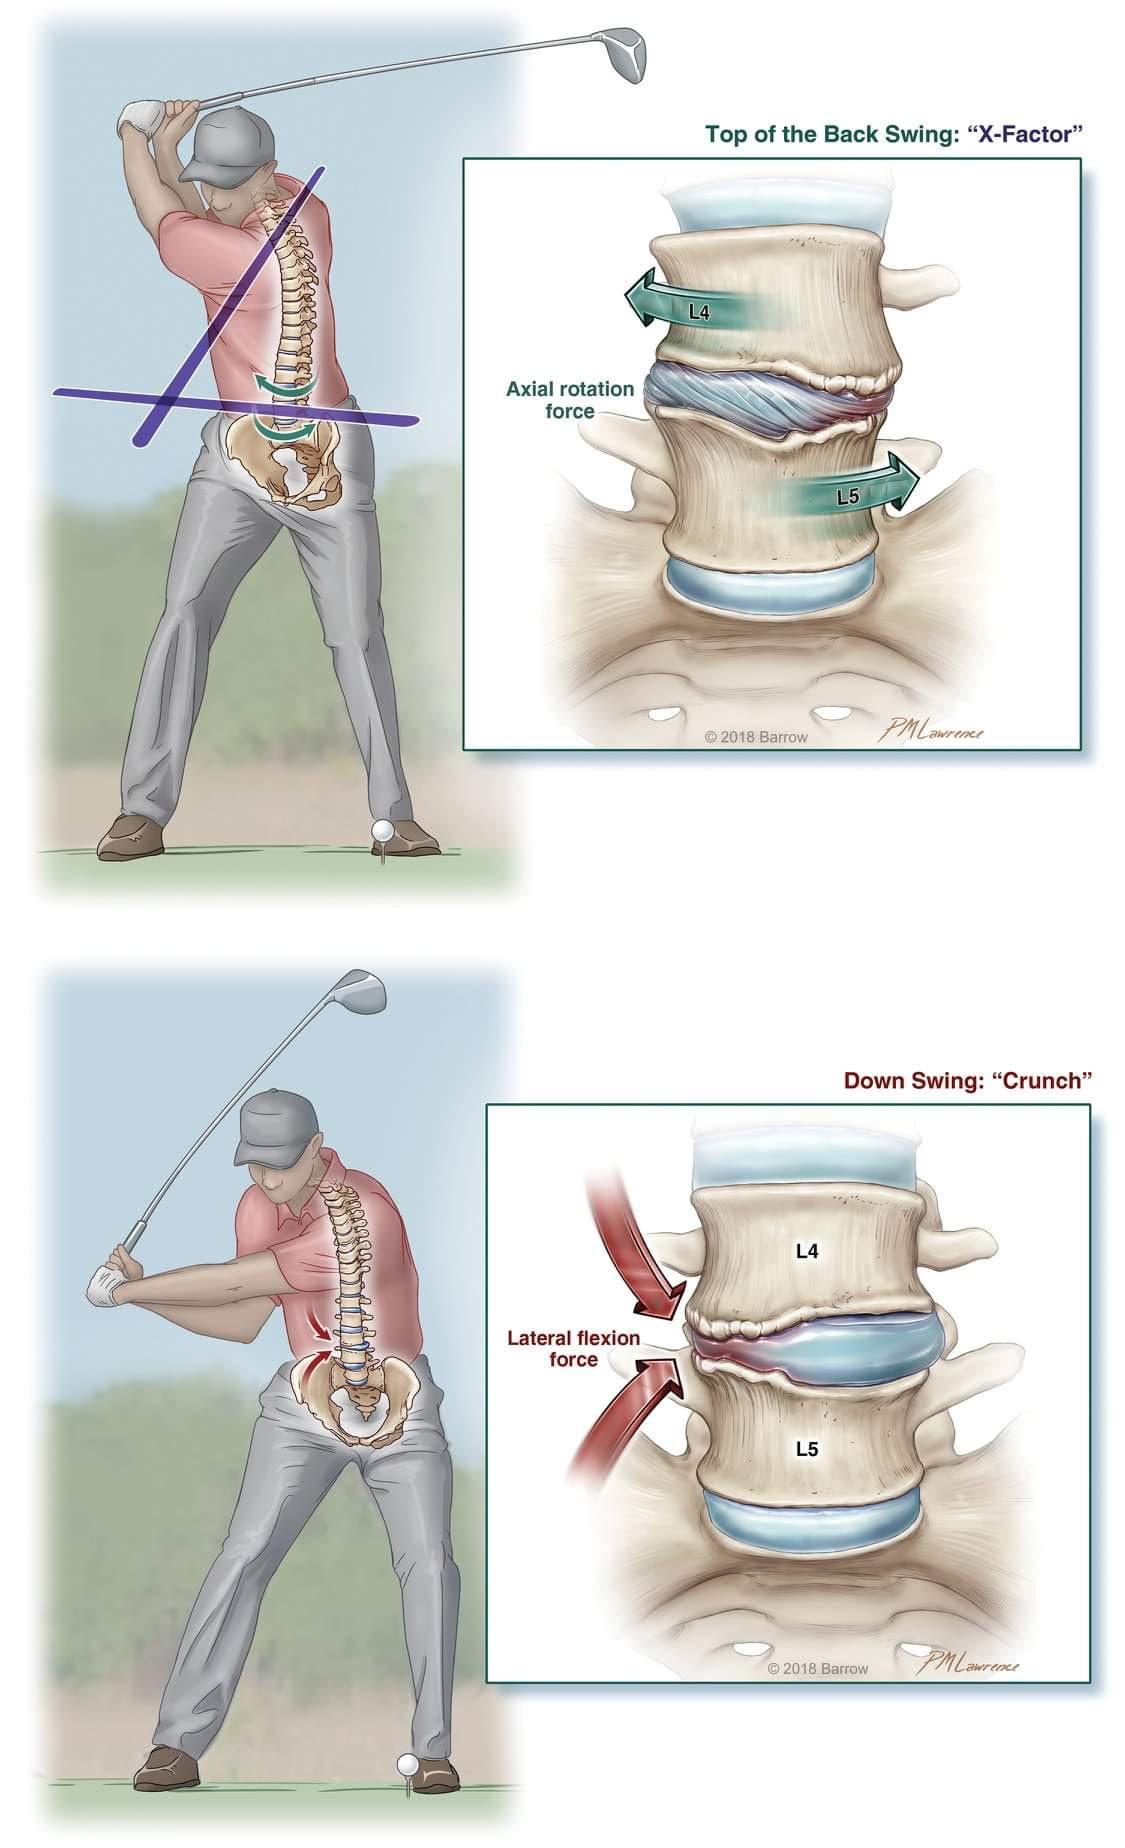 Back Swing Exercises